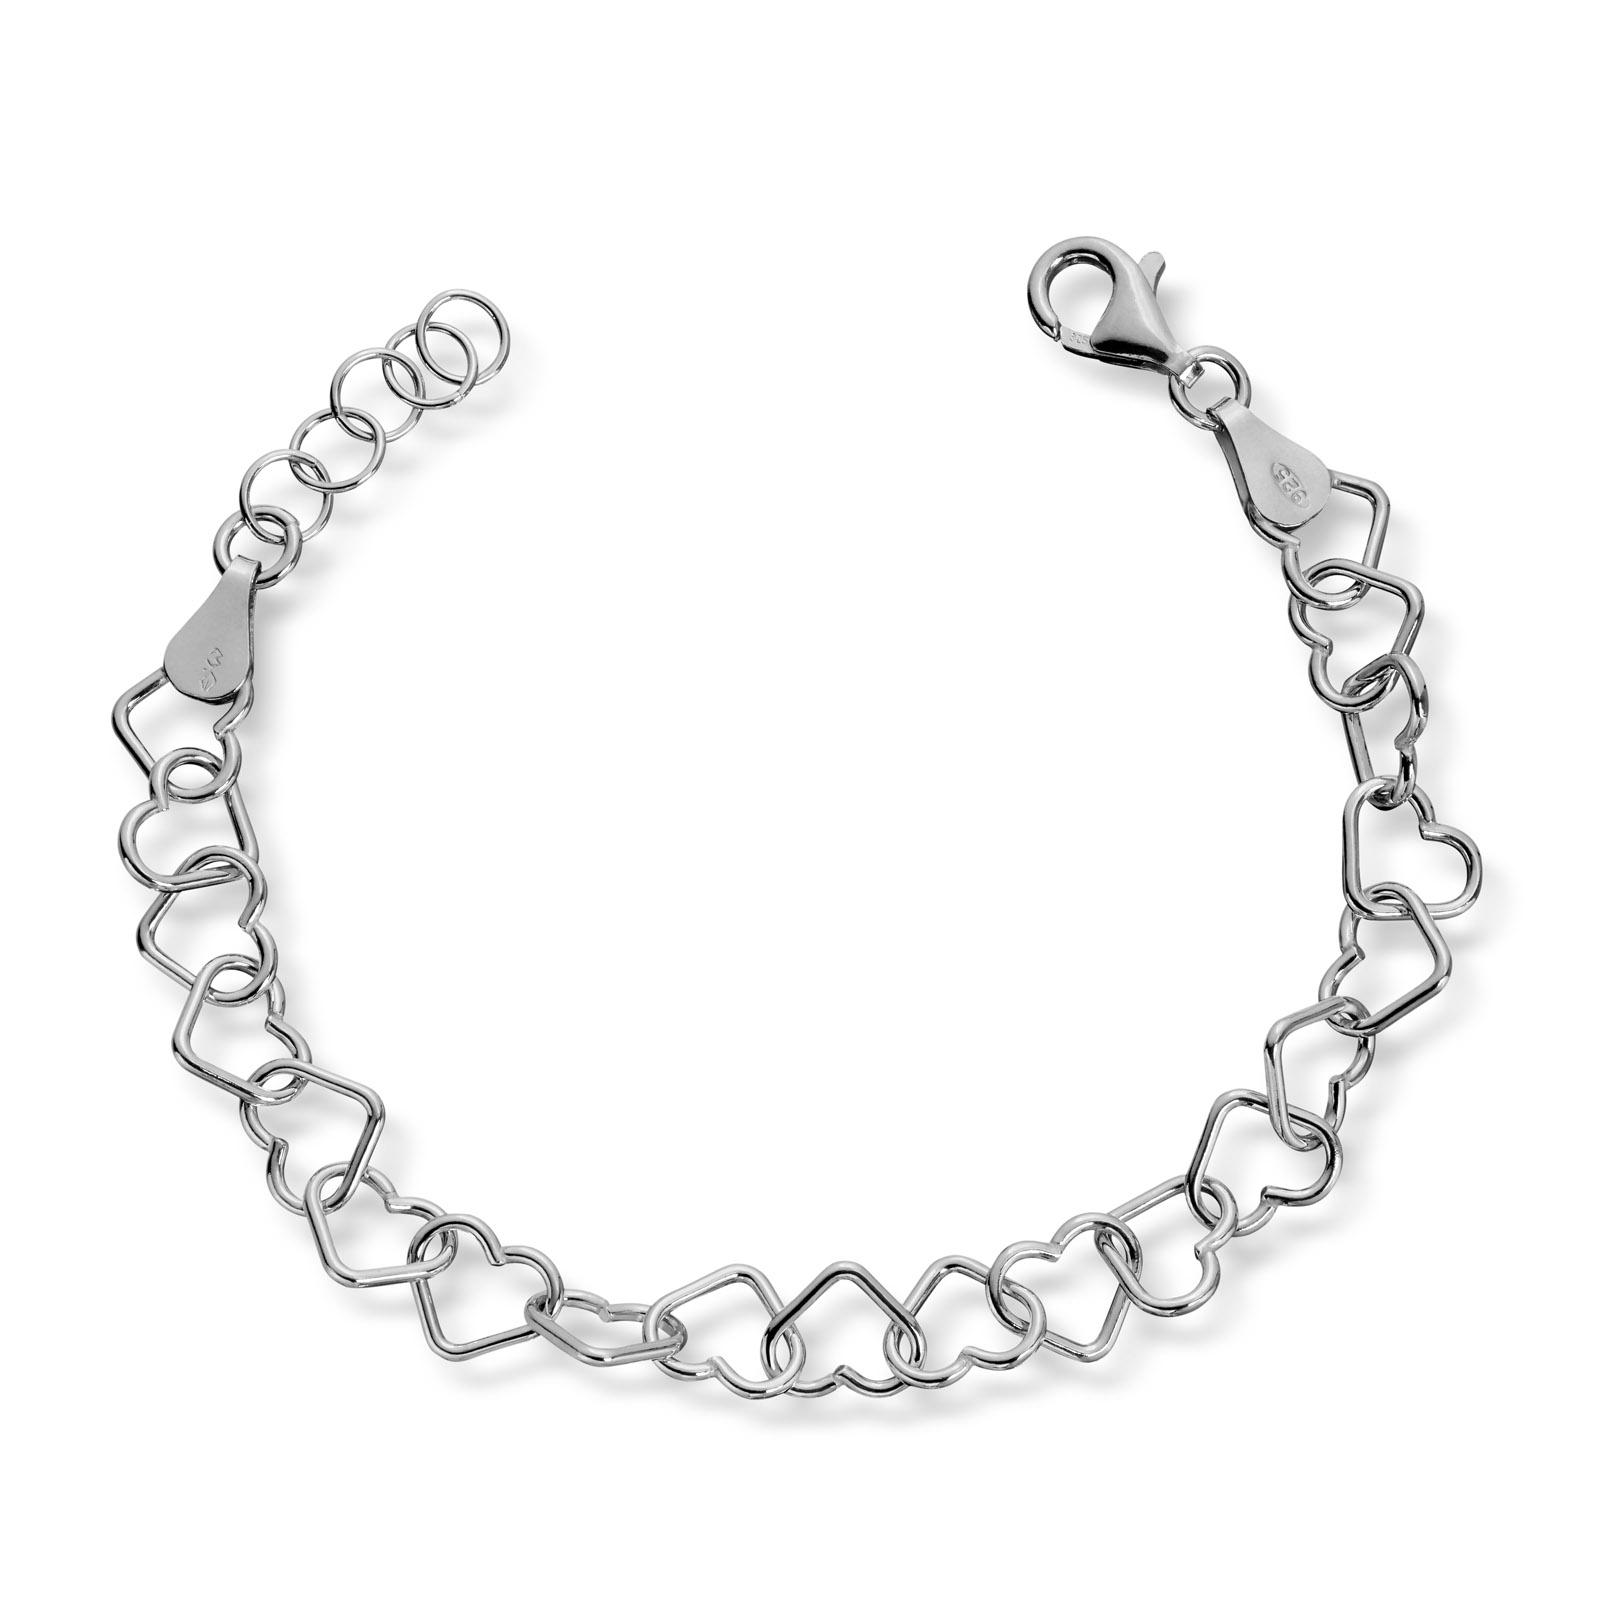 Mestergull Tøft armbånd i sølv med hjerter MG BASIC Armbånd